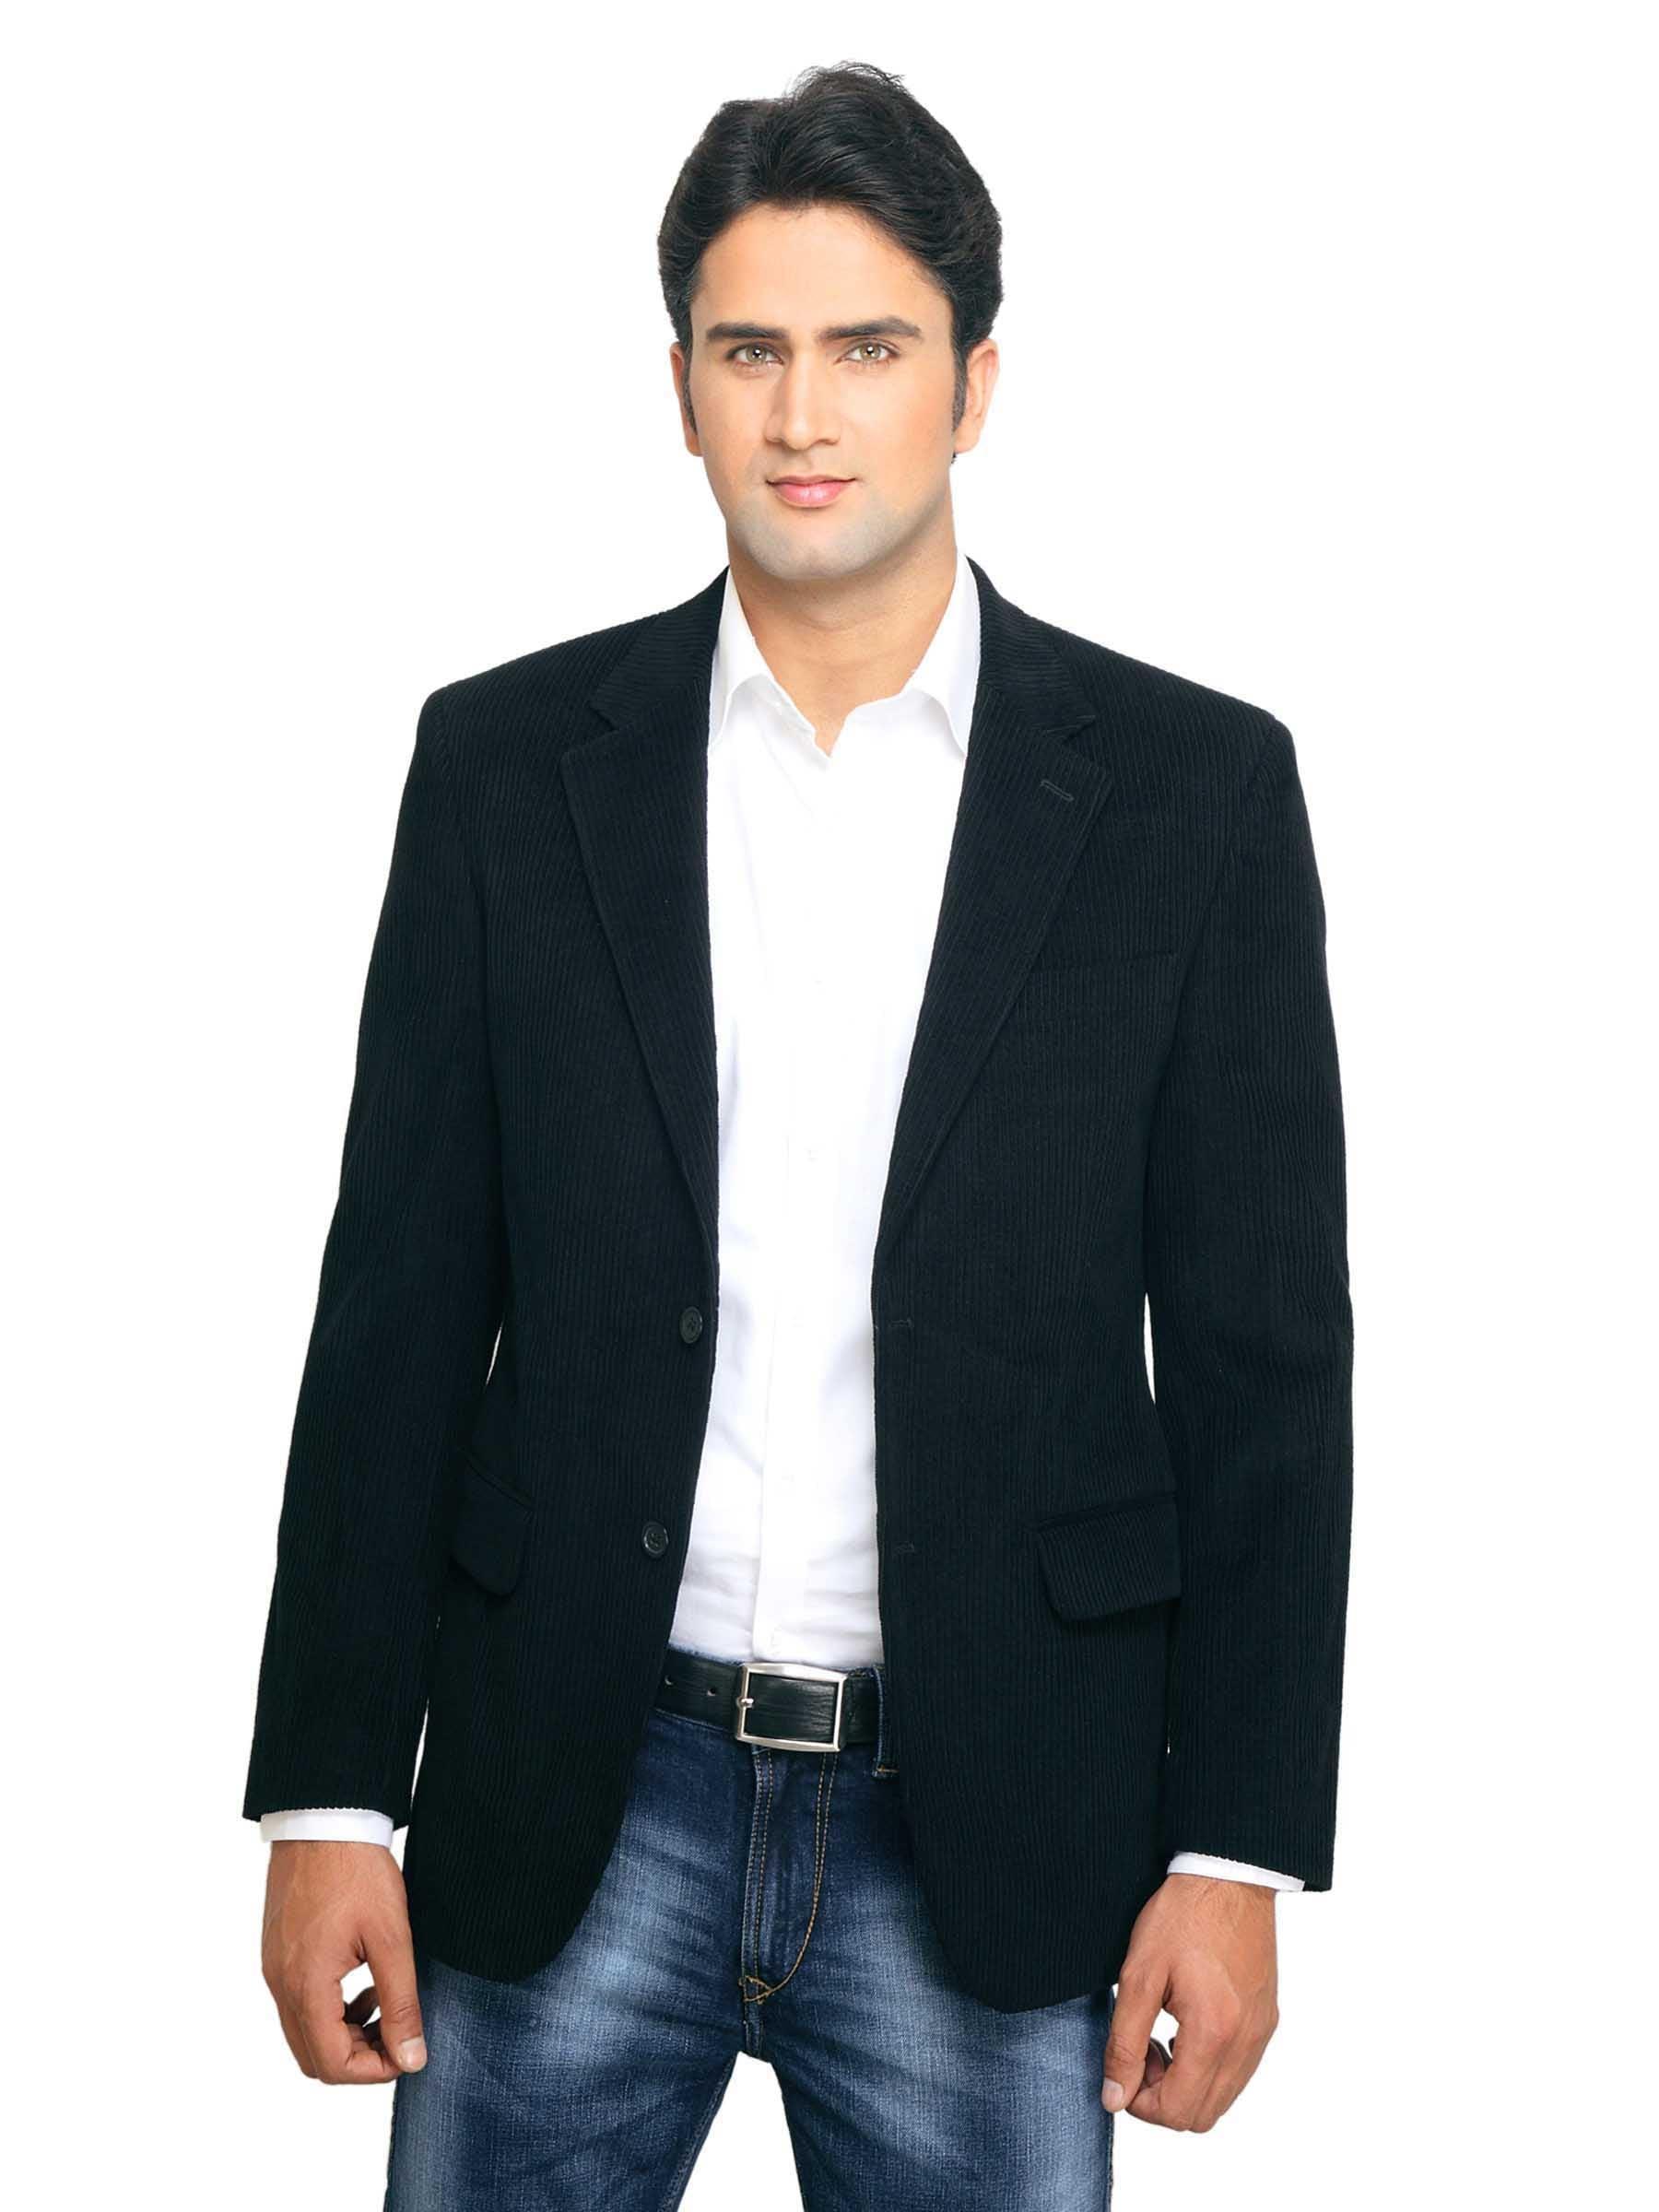 Buy Reid U0026 Taylor Men Semi Formal Black Blazer - 407 - Apparel For Men - 31742